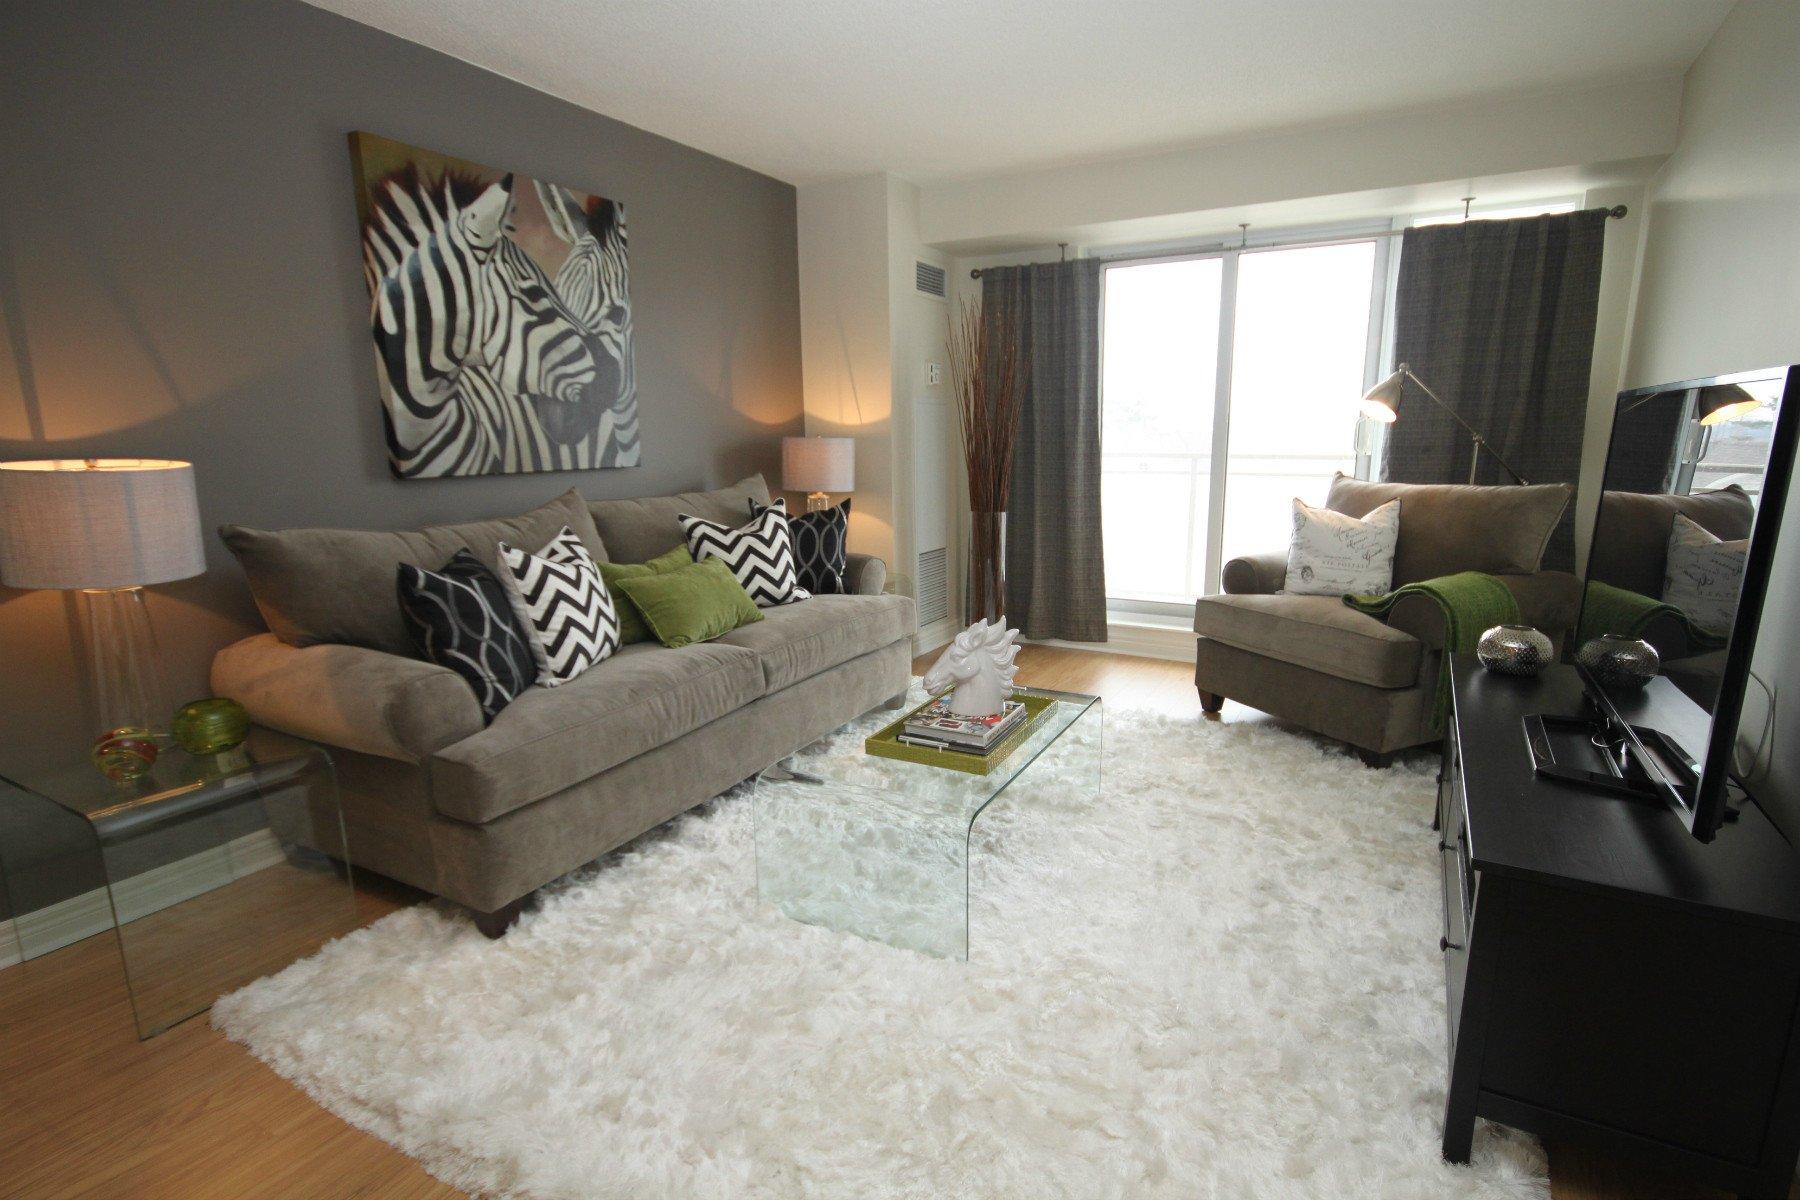 Modern Condo Living Room Decorating Ideas 34 Living Room Decorating Ideas for Apartments Living